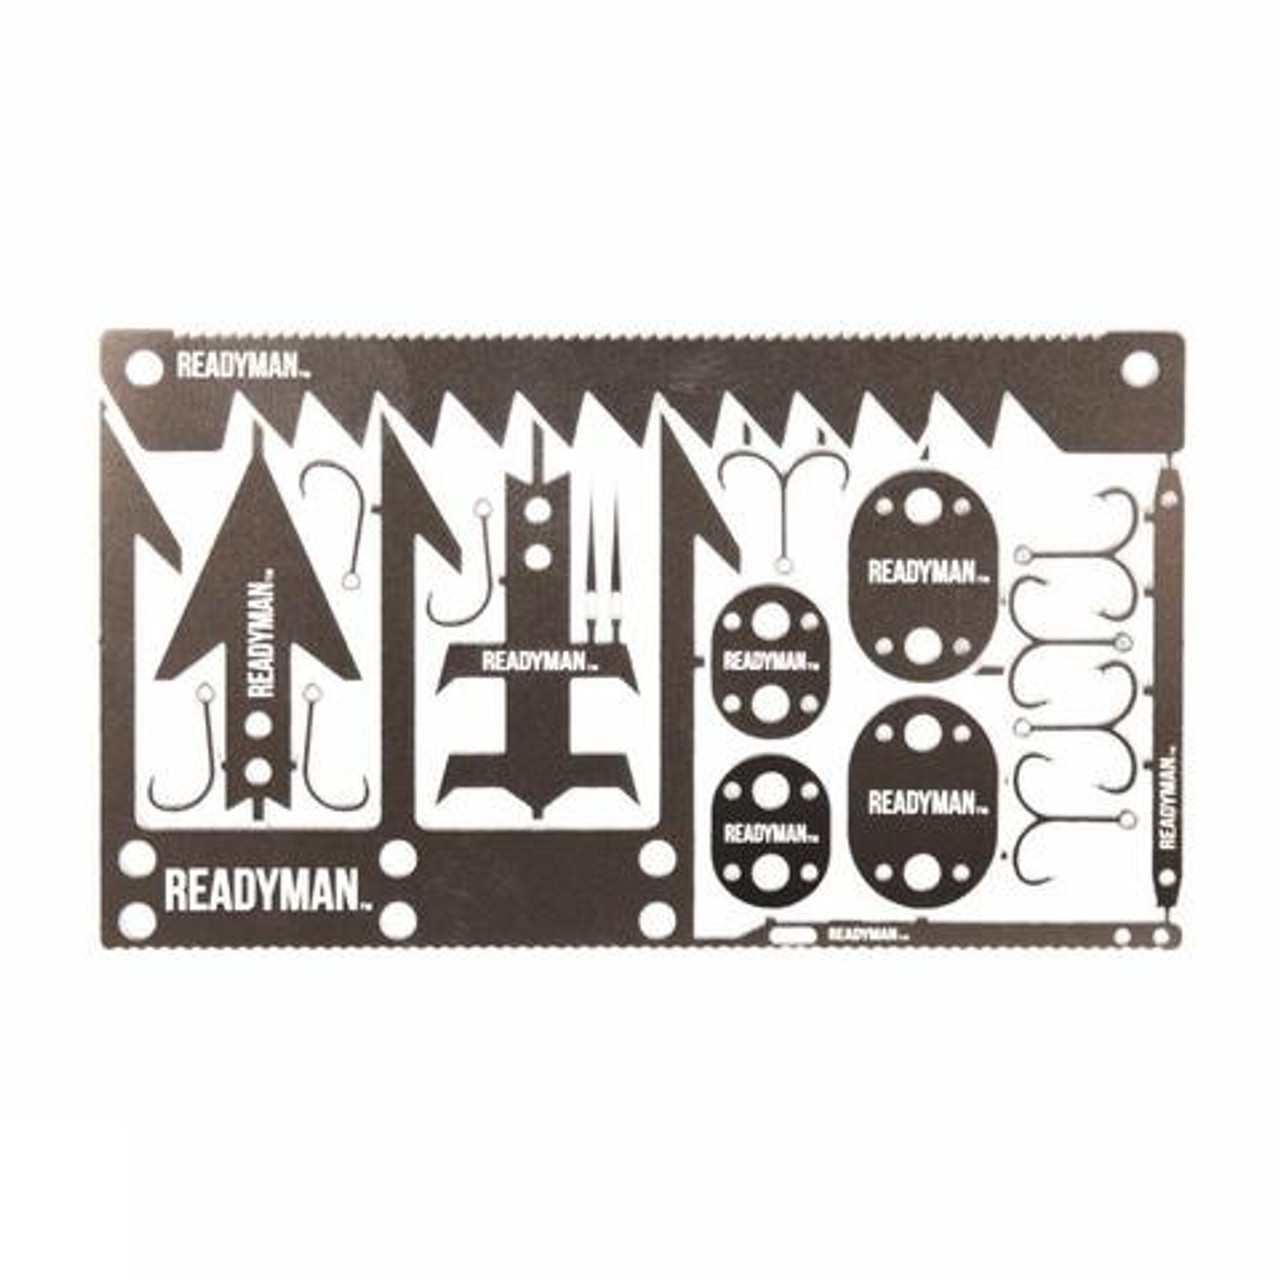 Readyman Enhanced Wilderness Survival Card